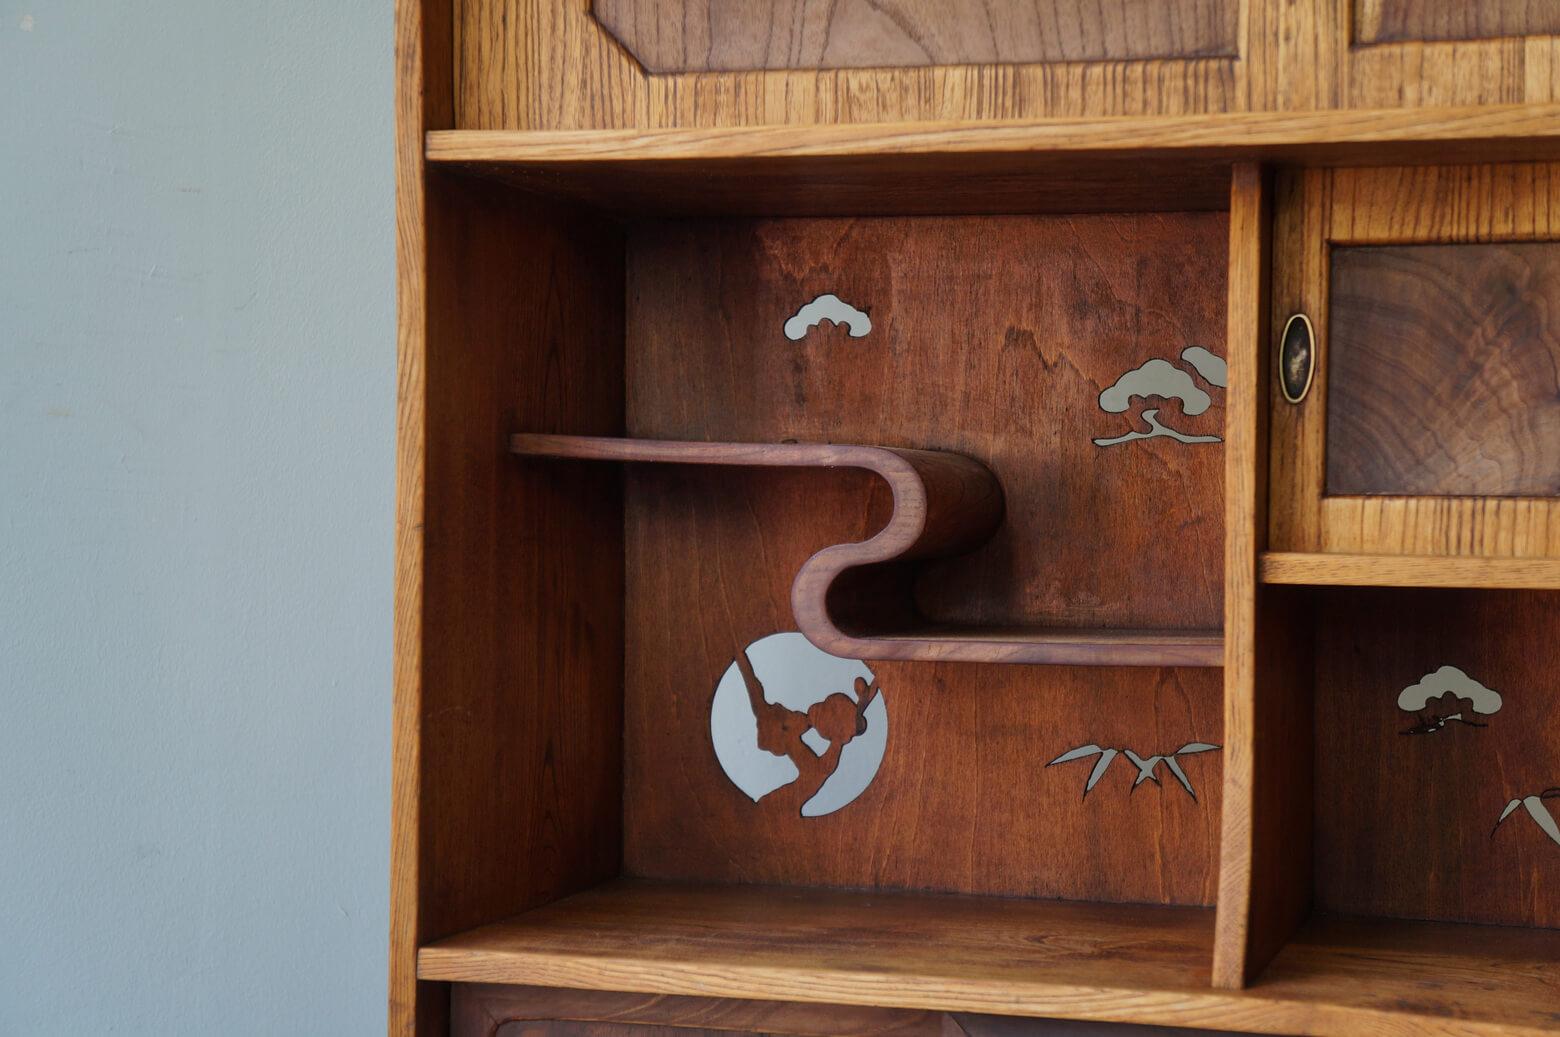 Japanese Retro Wooden Shelf